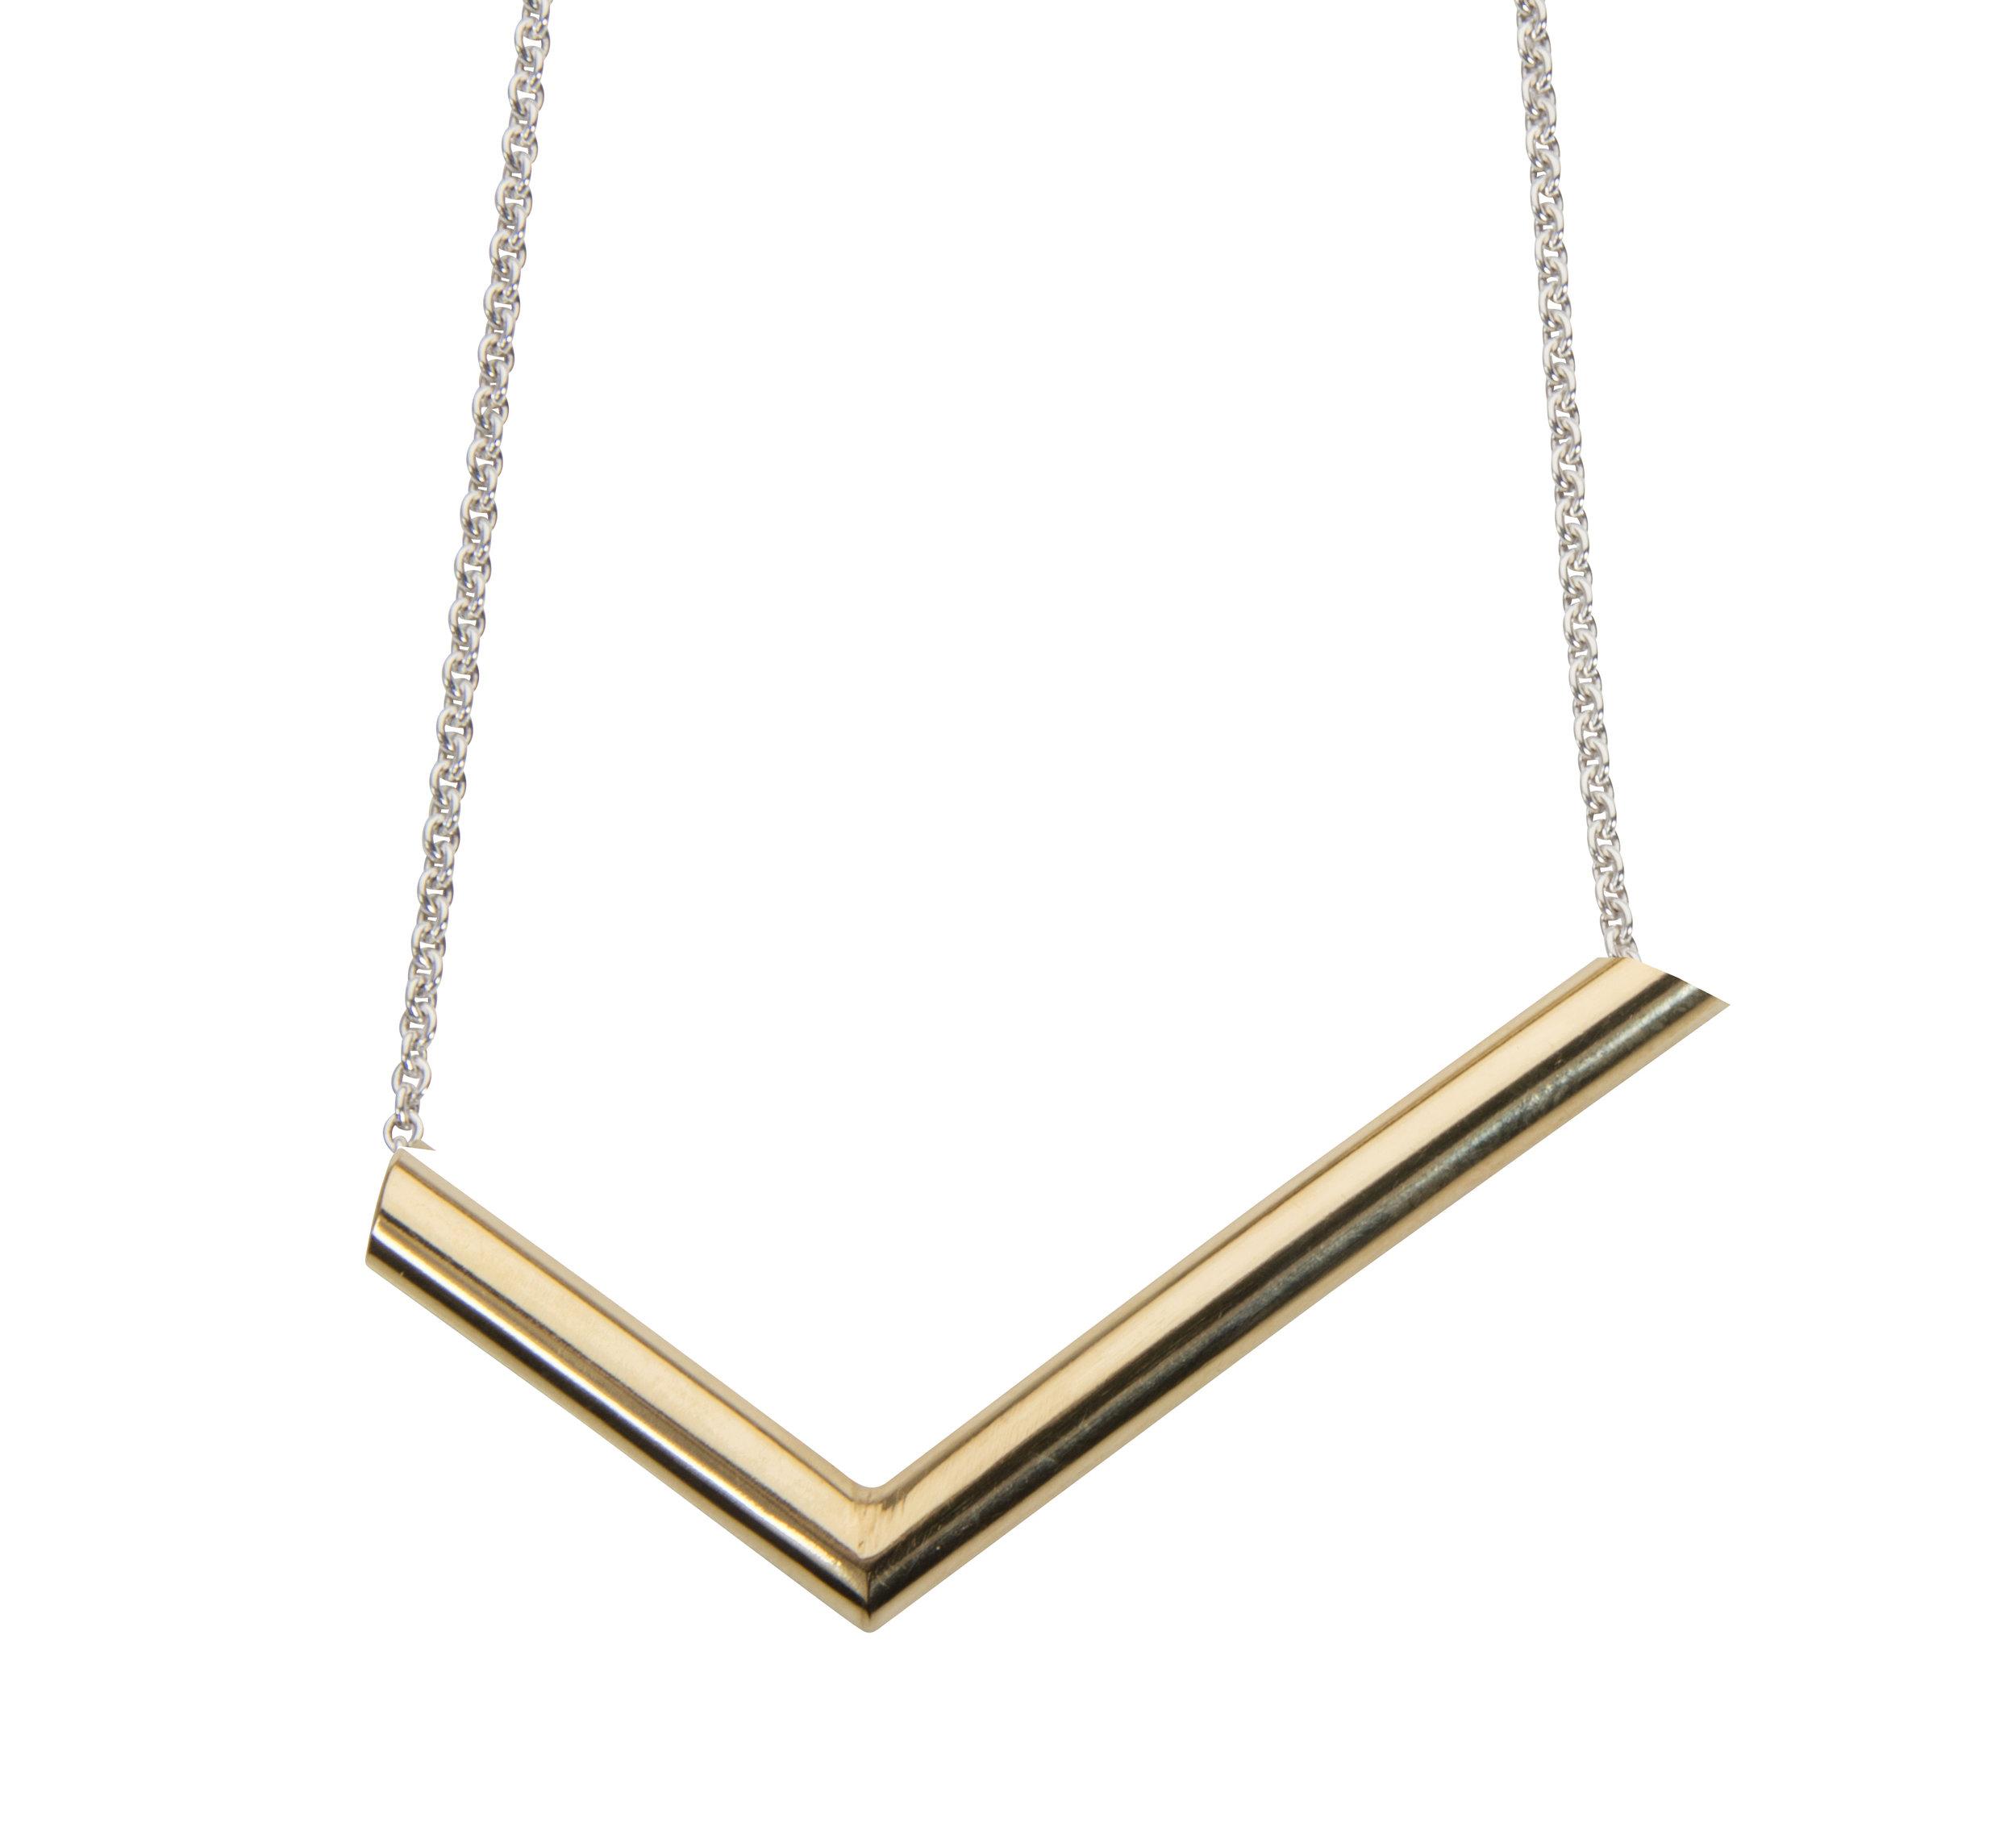 Emma Farquharson Gold 108 degree angle pendant large.jpg